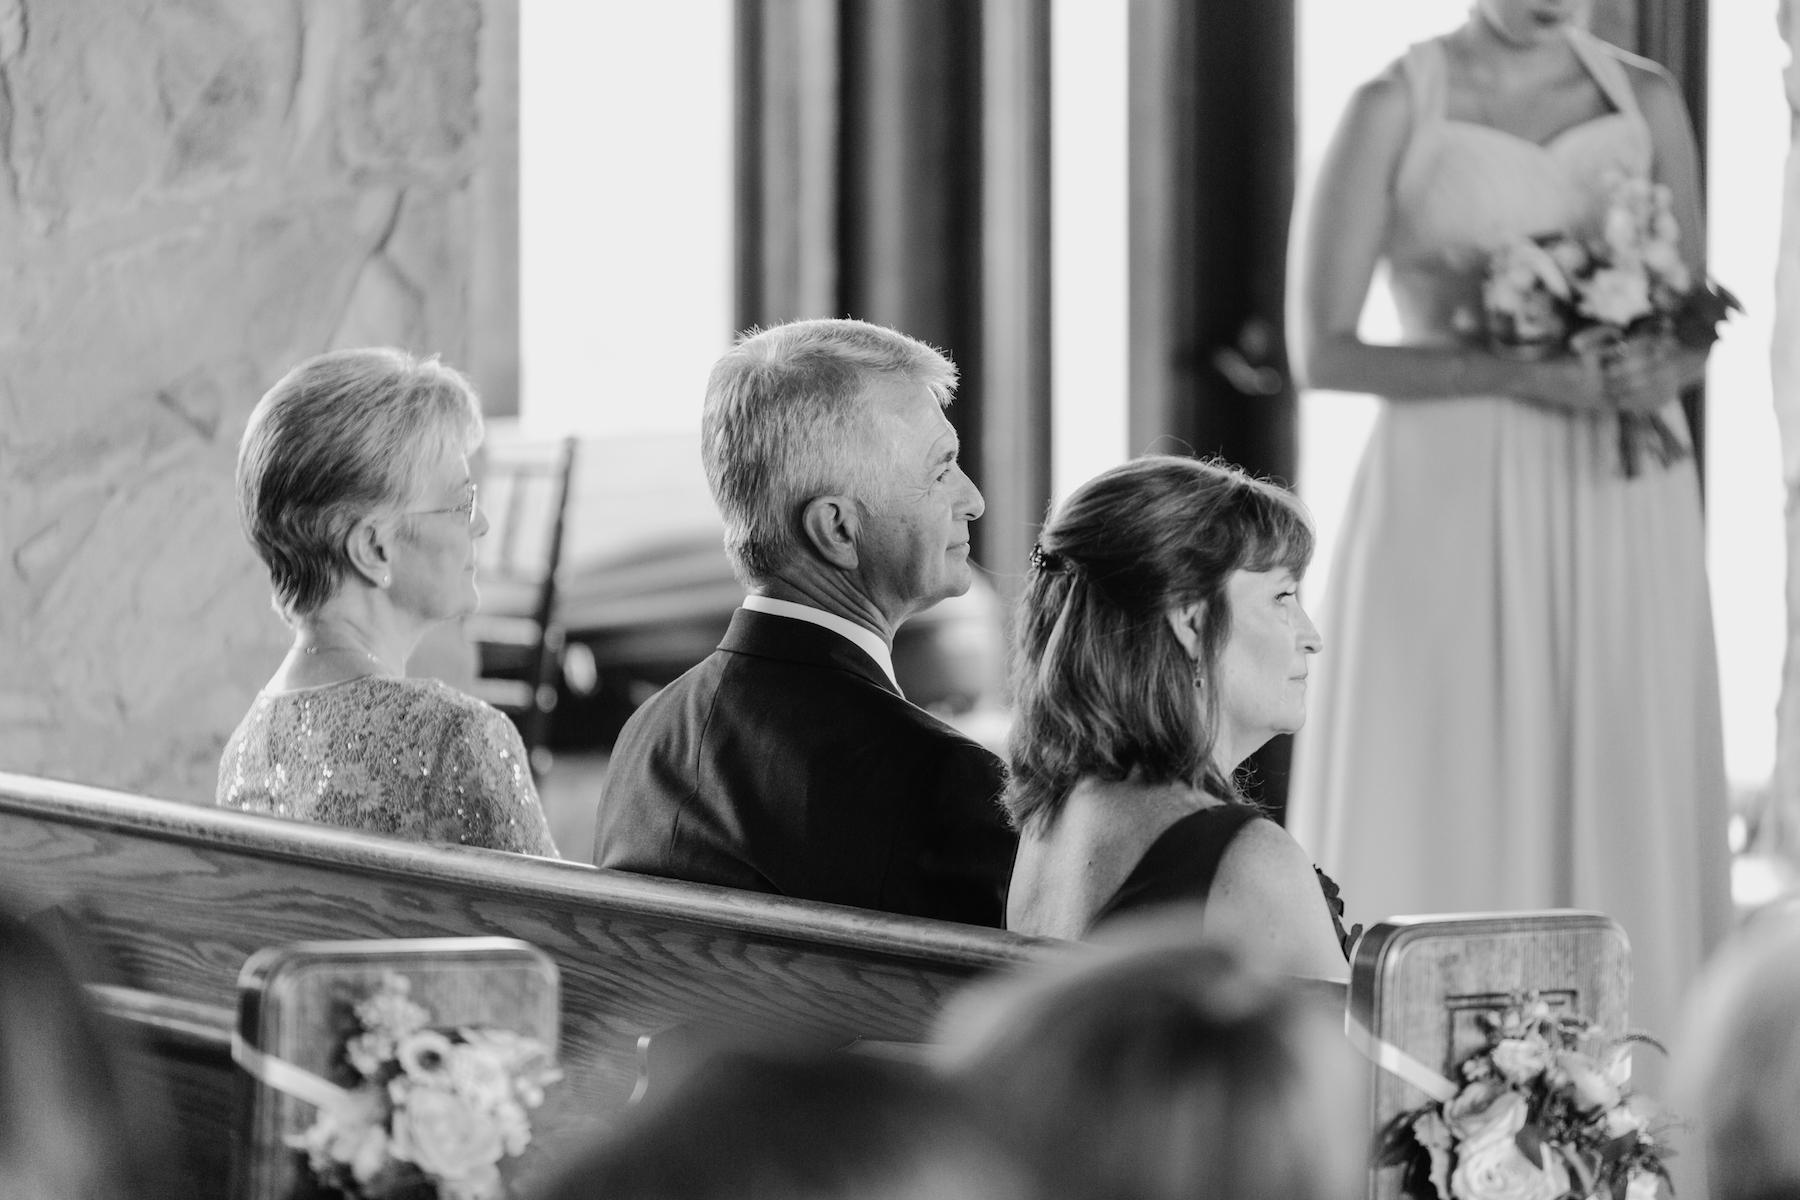 wedding-engagement-photographer-spartanburg-greenville-columbia-carolina-south-north-493.JPG